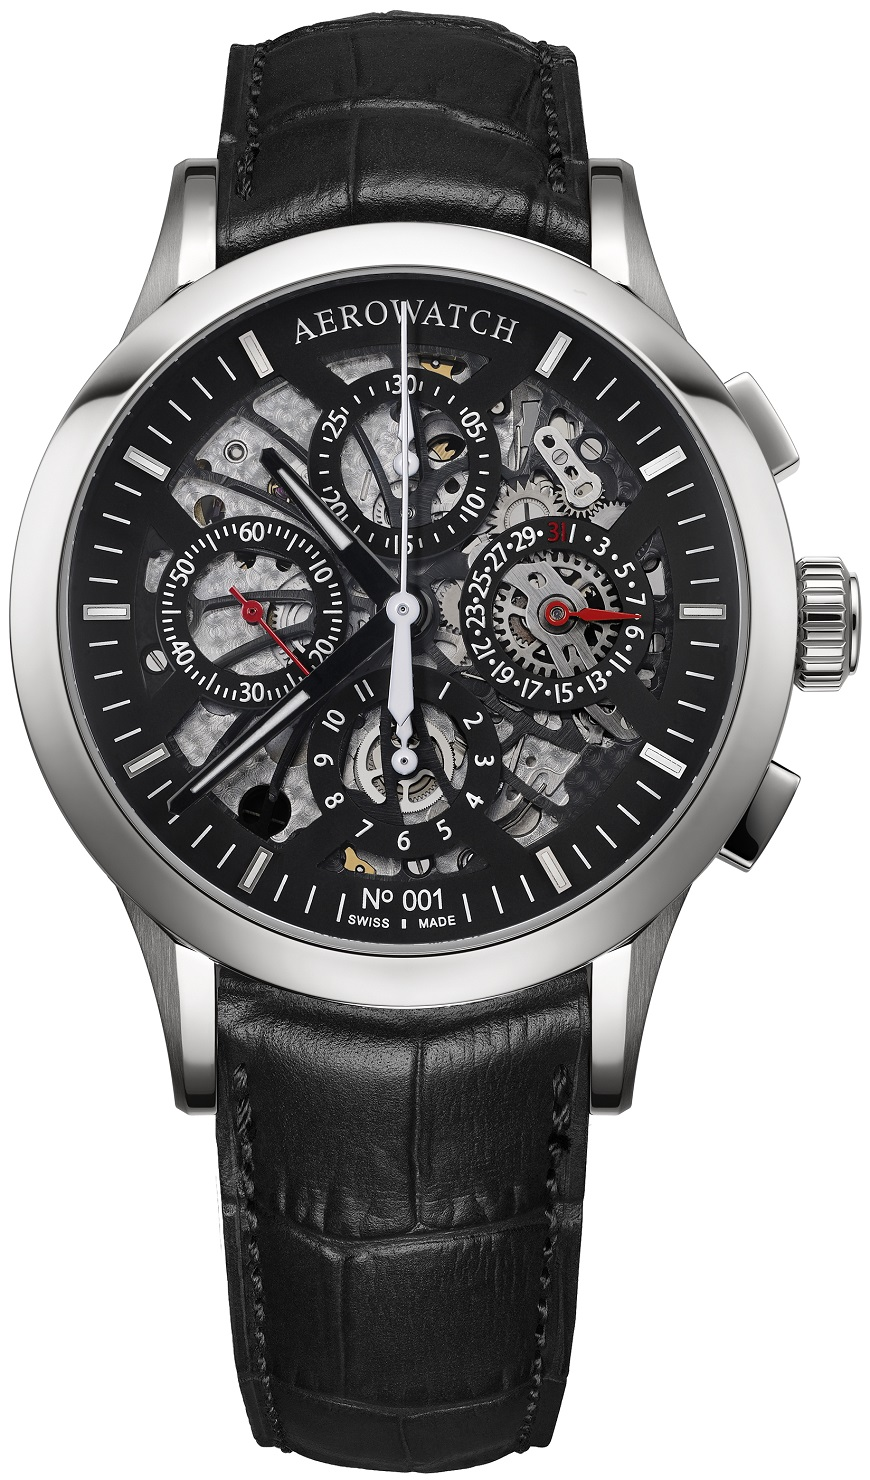 A AEROWATCH  Les Grandes Classiques - automatische Semi-Skeleton Chronograaf